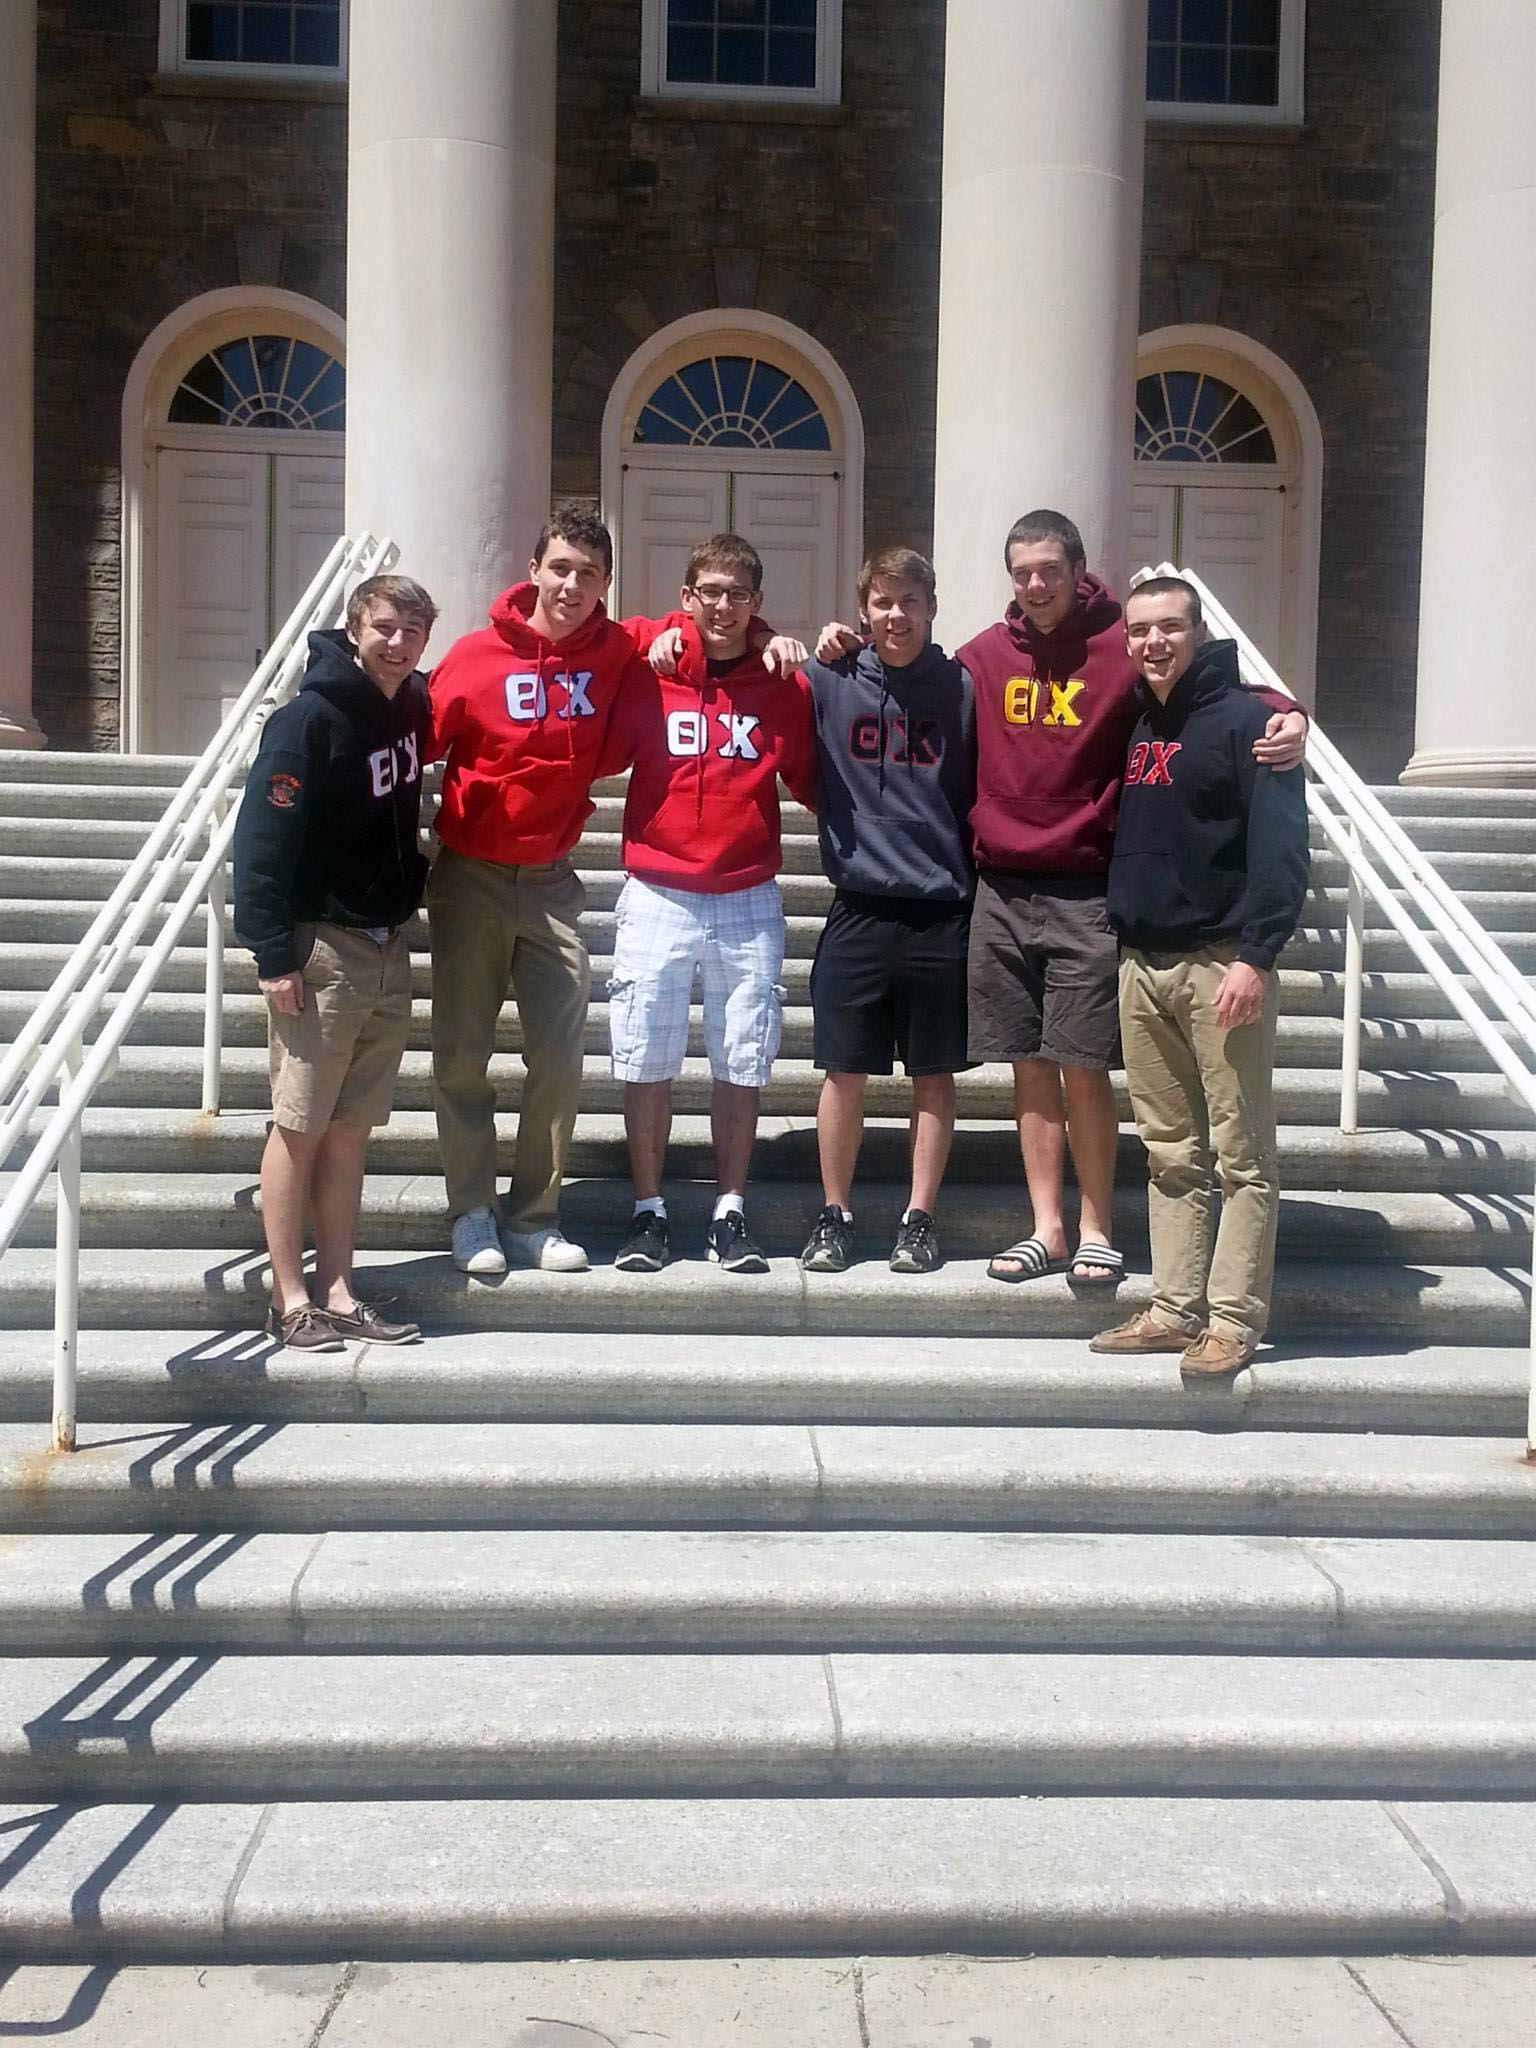 Steve Sandford, Alex Constable, Edward Brand, Ryan Gattoni and Frank Donato at Old Main - April 2014